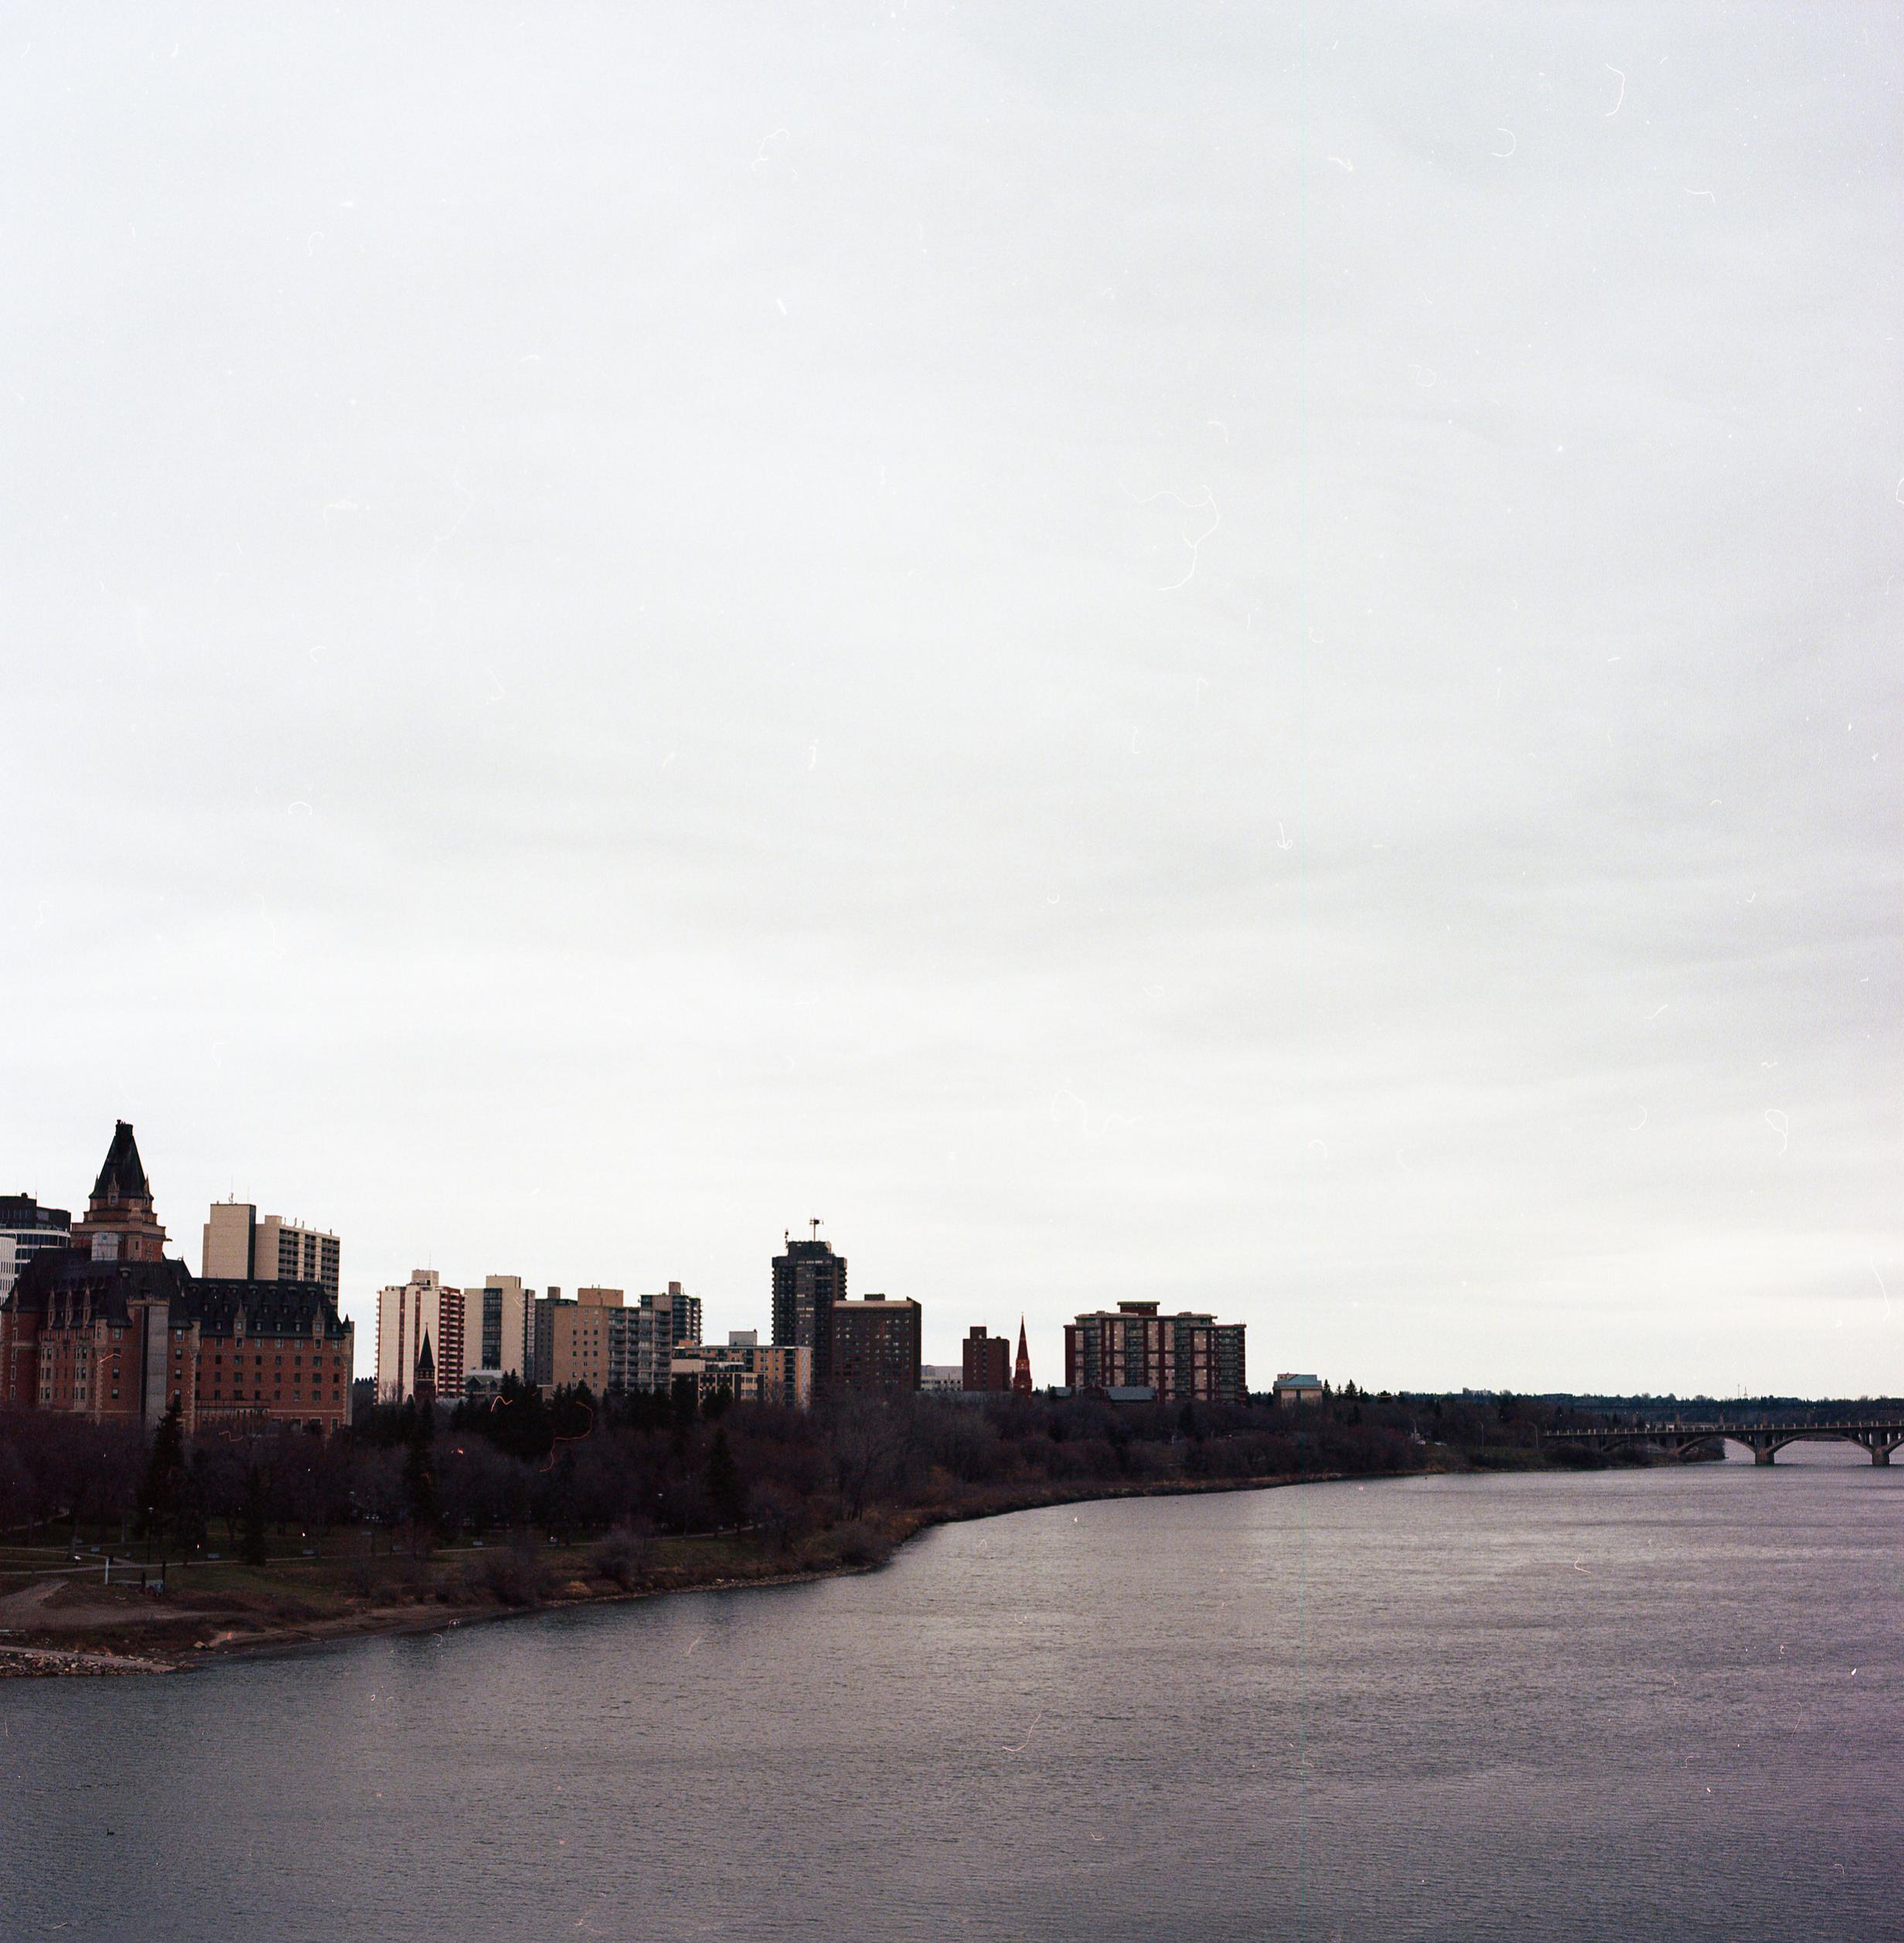 The view from Broadway Bridge in Saskatoon, Saskatchewan.| Hasselblad 500CM / Portra 160 @ 640